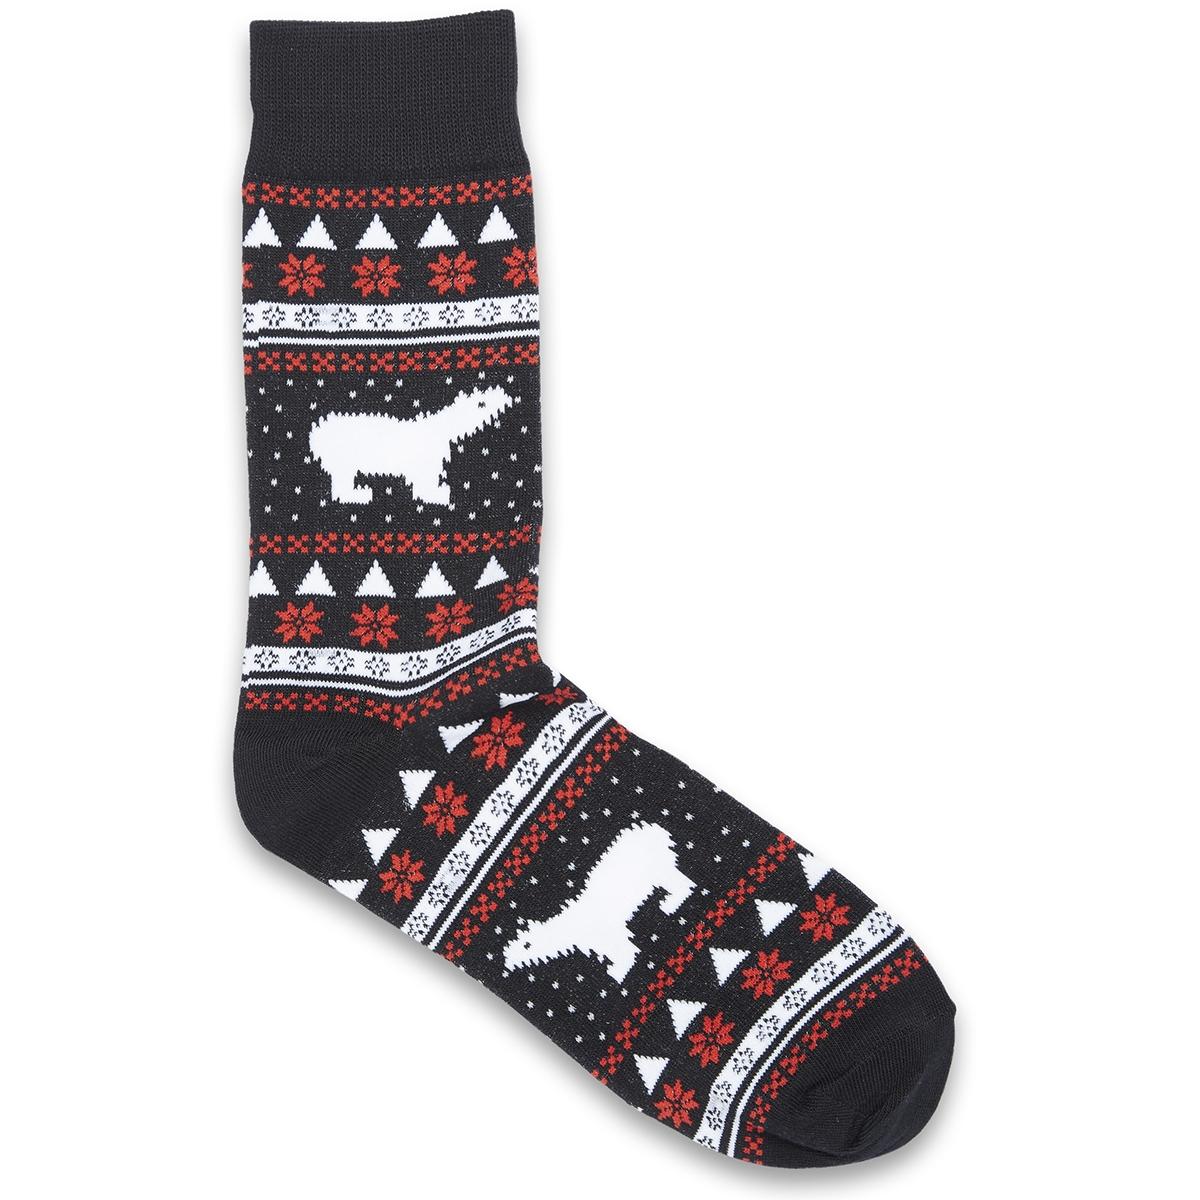 jacx-mas trunks & socks giftbox 12132401 jack & jones accessoire black/snowman